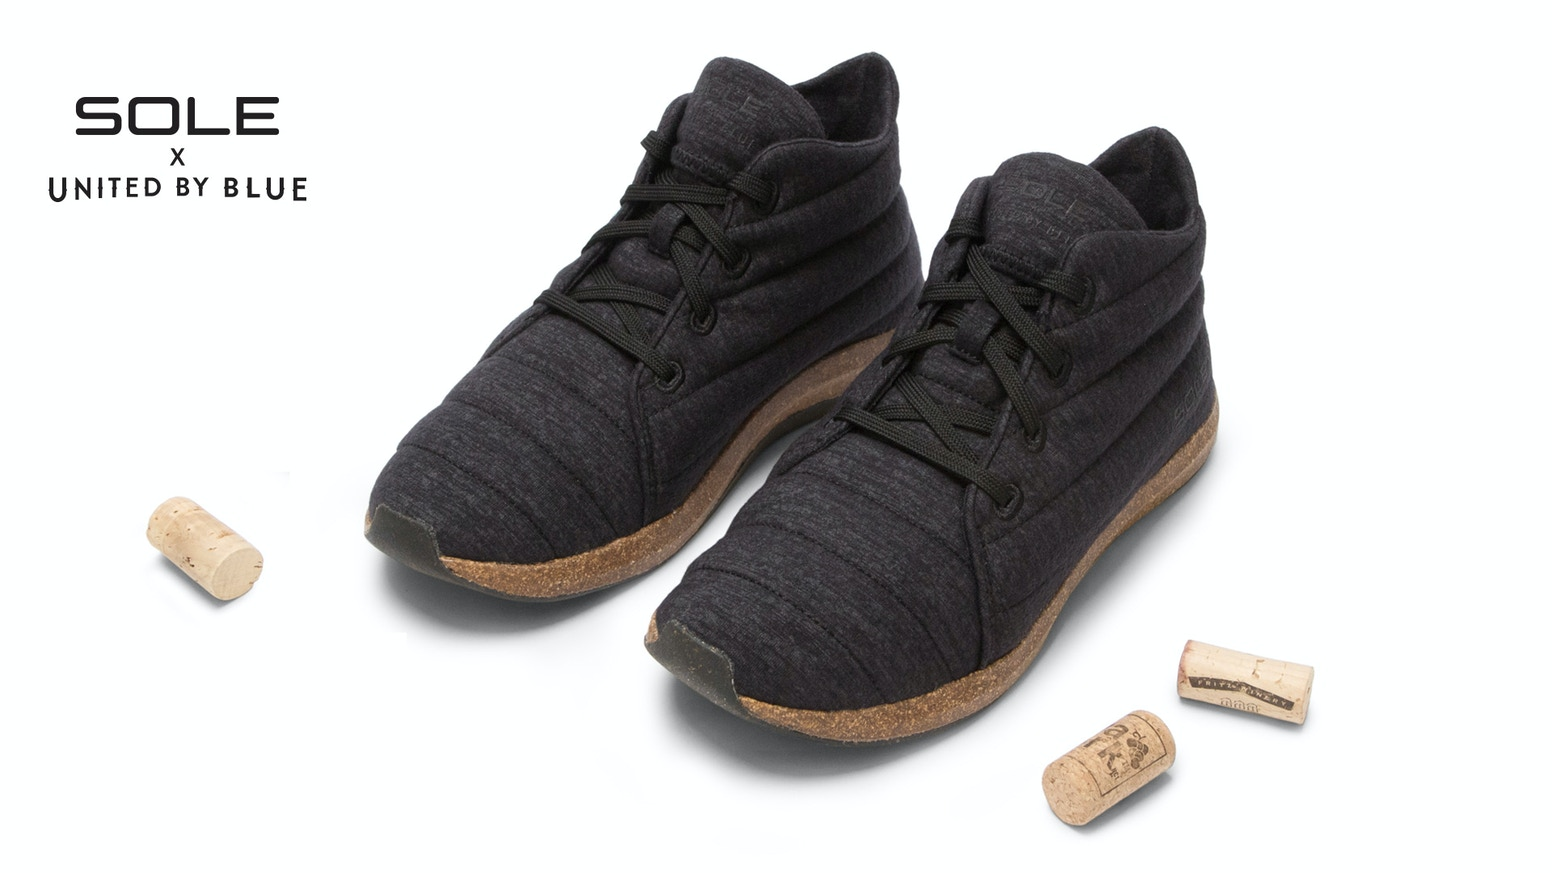 b0a42358a86 The World s Most Eco-Friendly Shoe by Brian Linton — Kickstarter